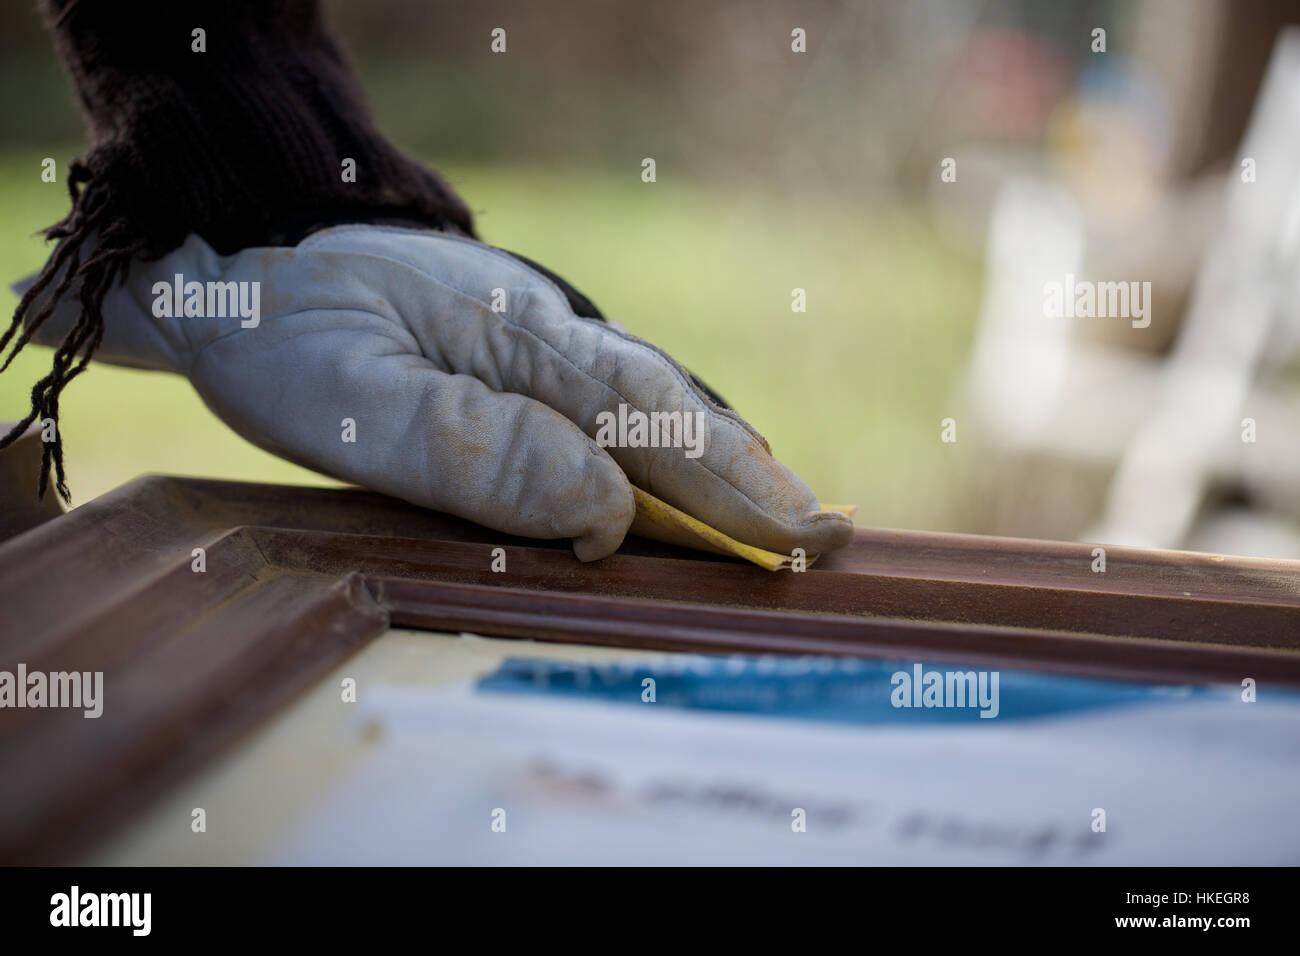 carpenter sanding wooden surface. sand paper, glove, working, wood. - Stock Image